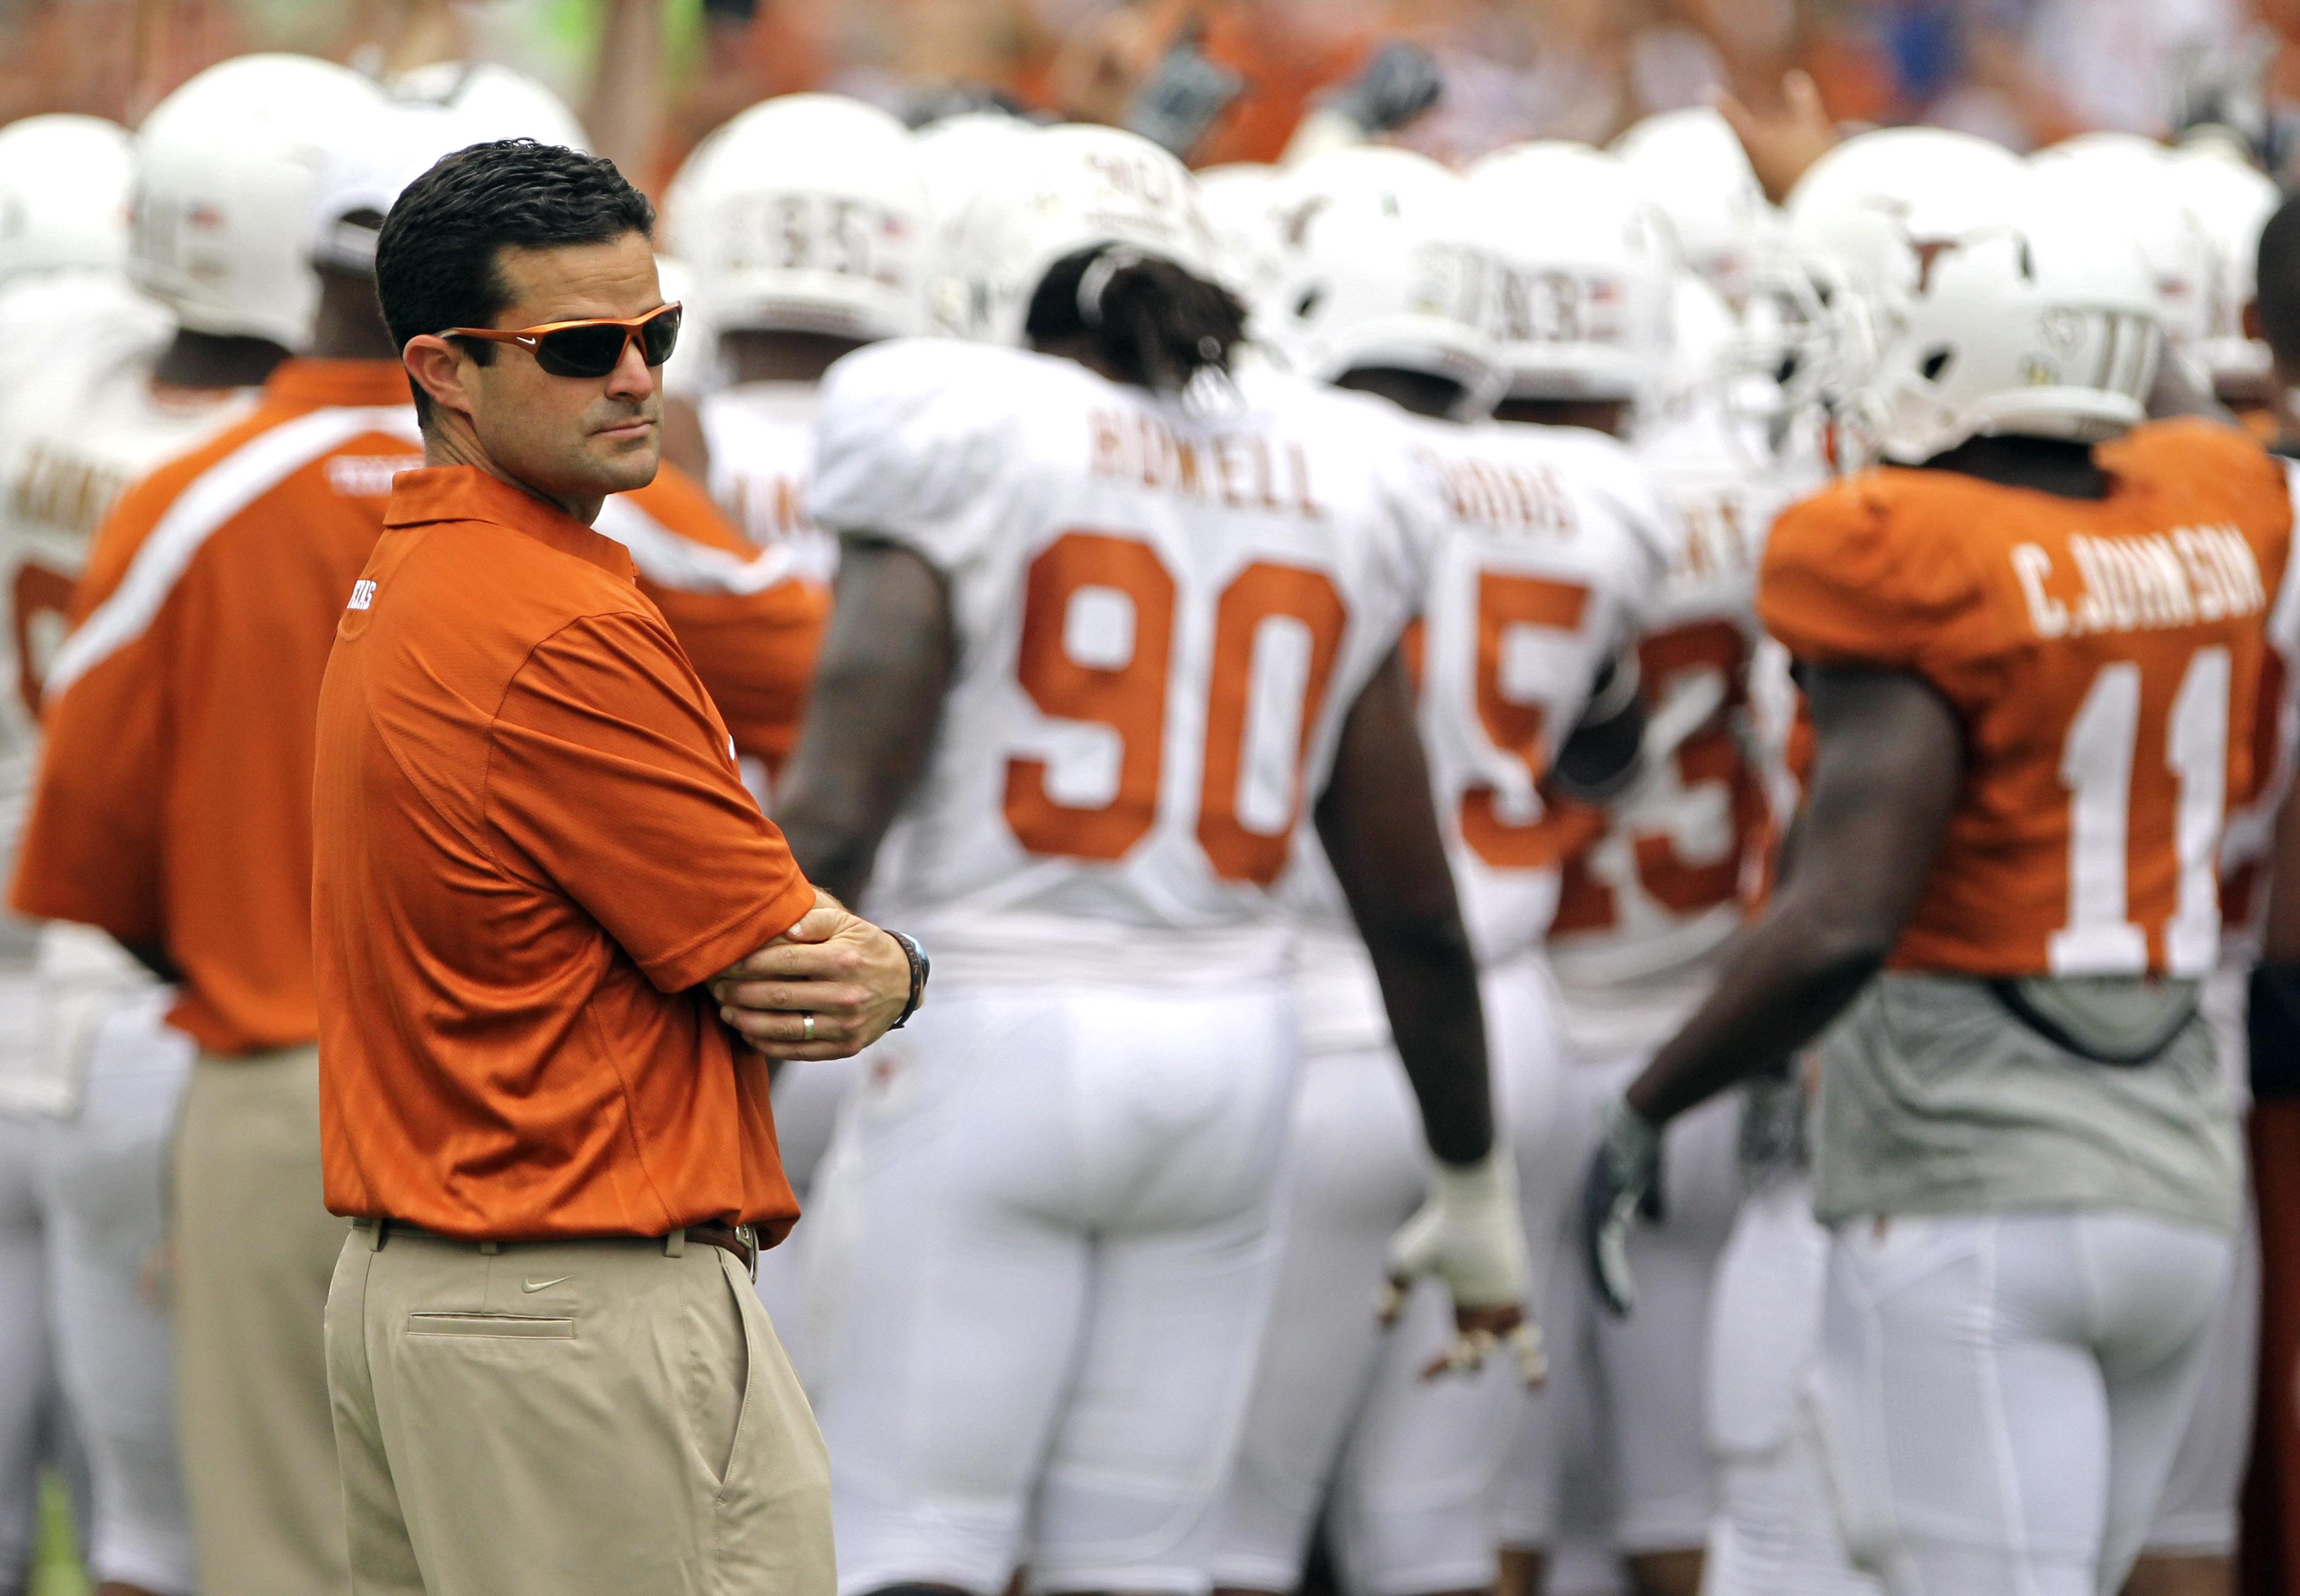 Texas' new defensive coordinator Manny Diaz looks on before  the Texas Orange and White spring football scrimmage on April 3, 2011, in Austin, Texas. The Orange team won 27-7. (AP Photo/Michael Thomas)